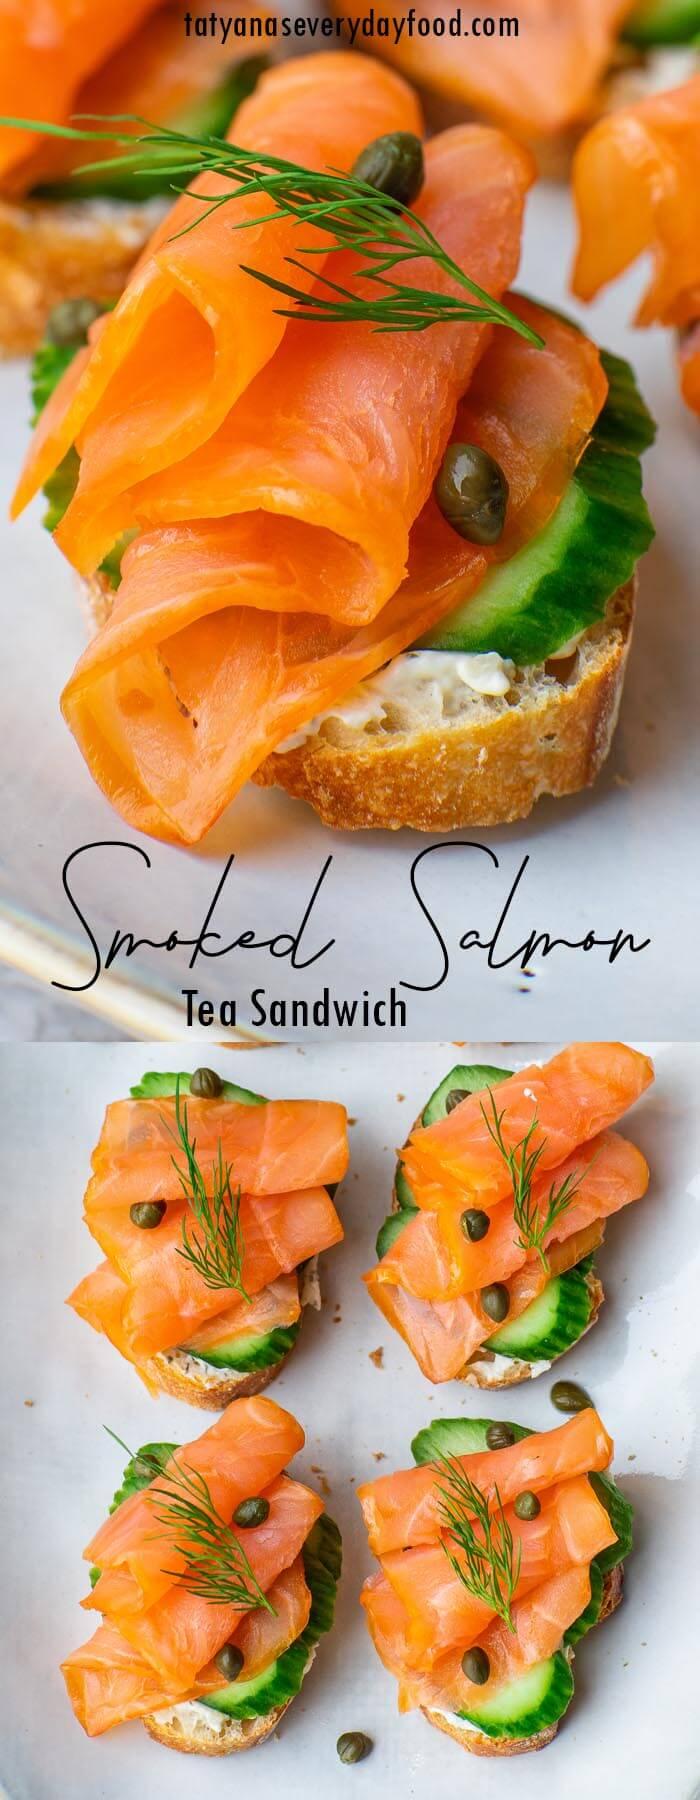 Smoked Salmon Tea Sandwich recipe